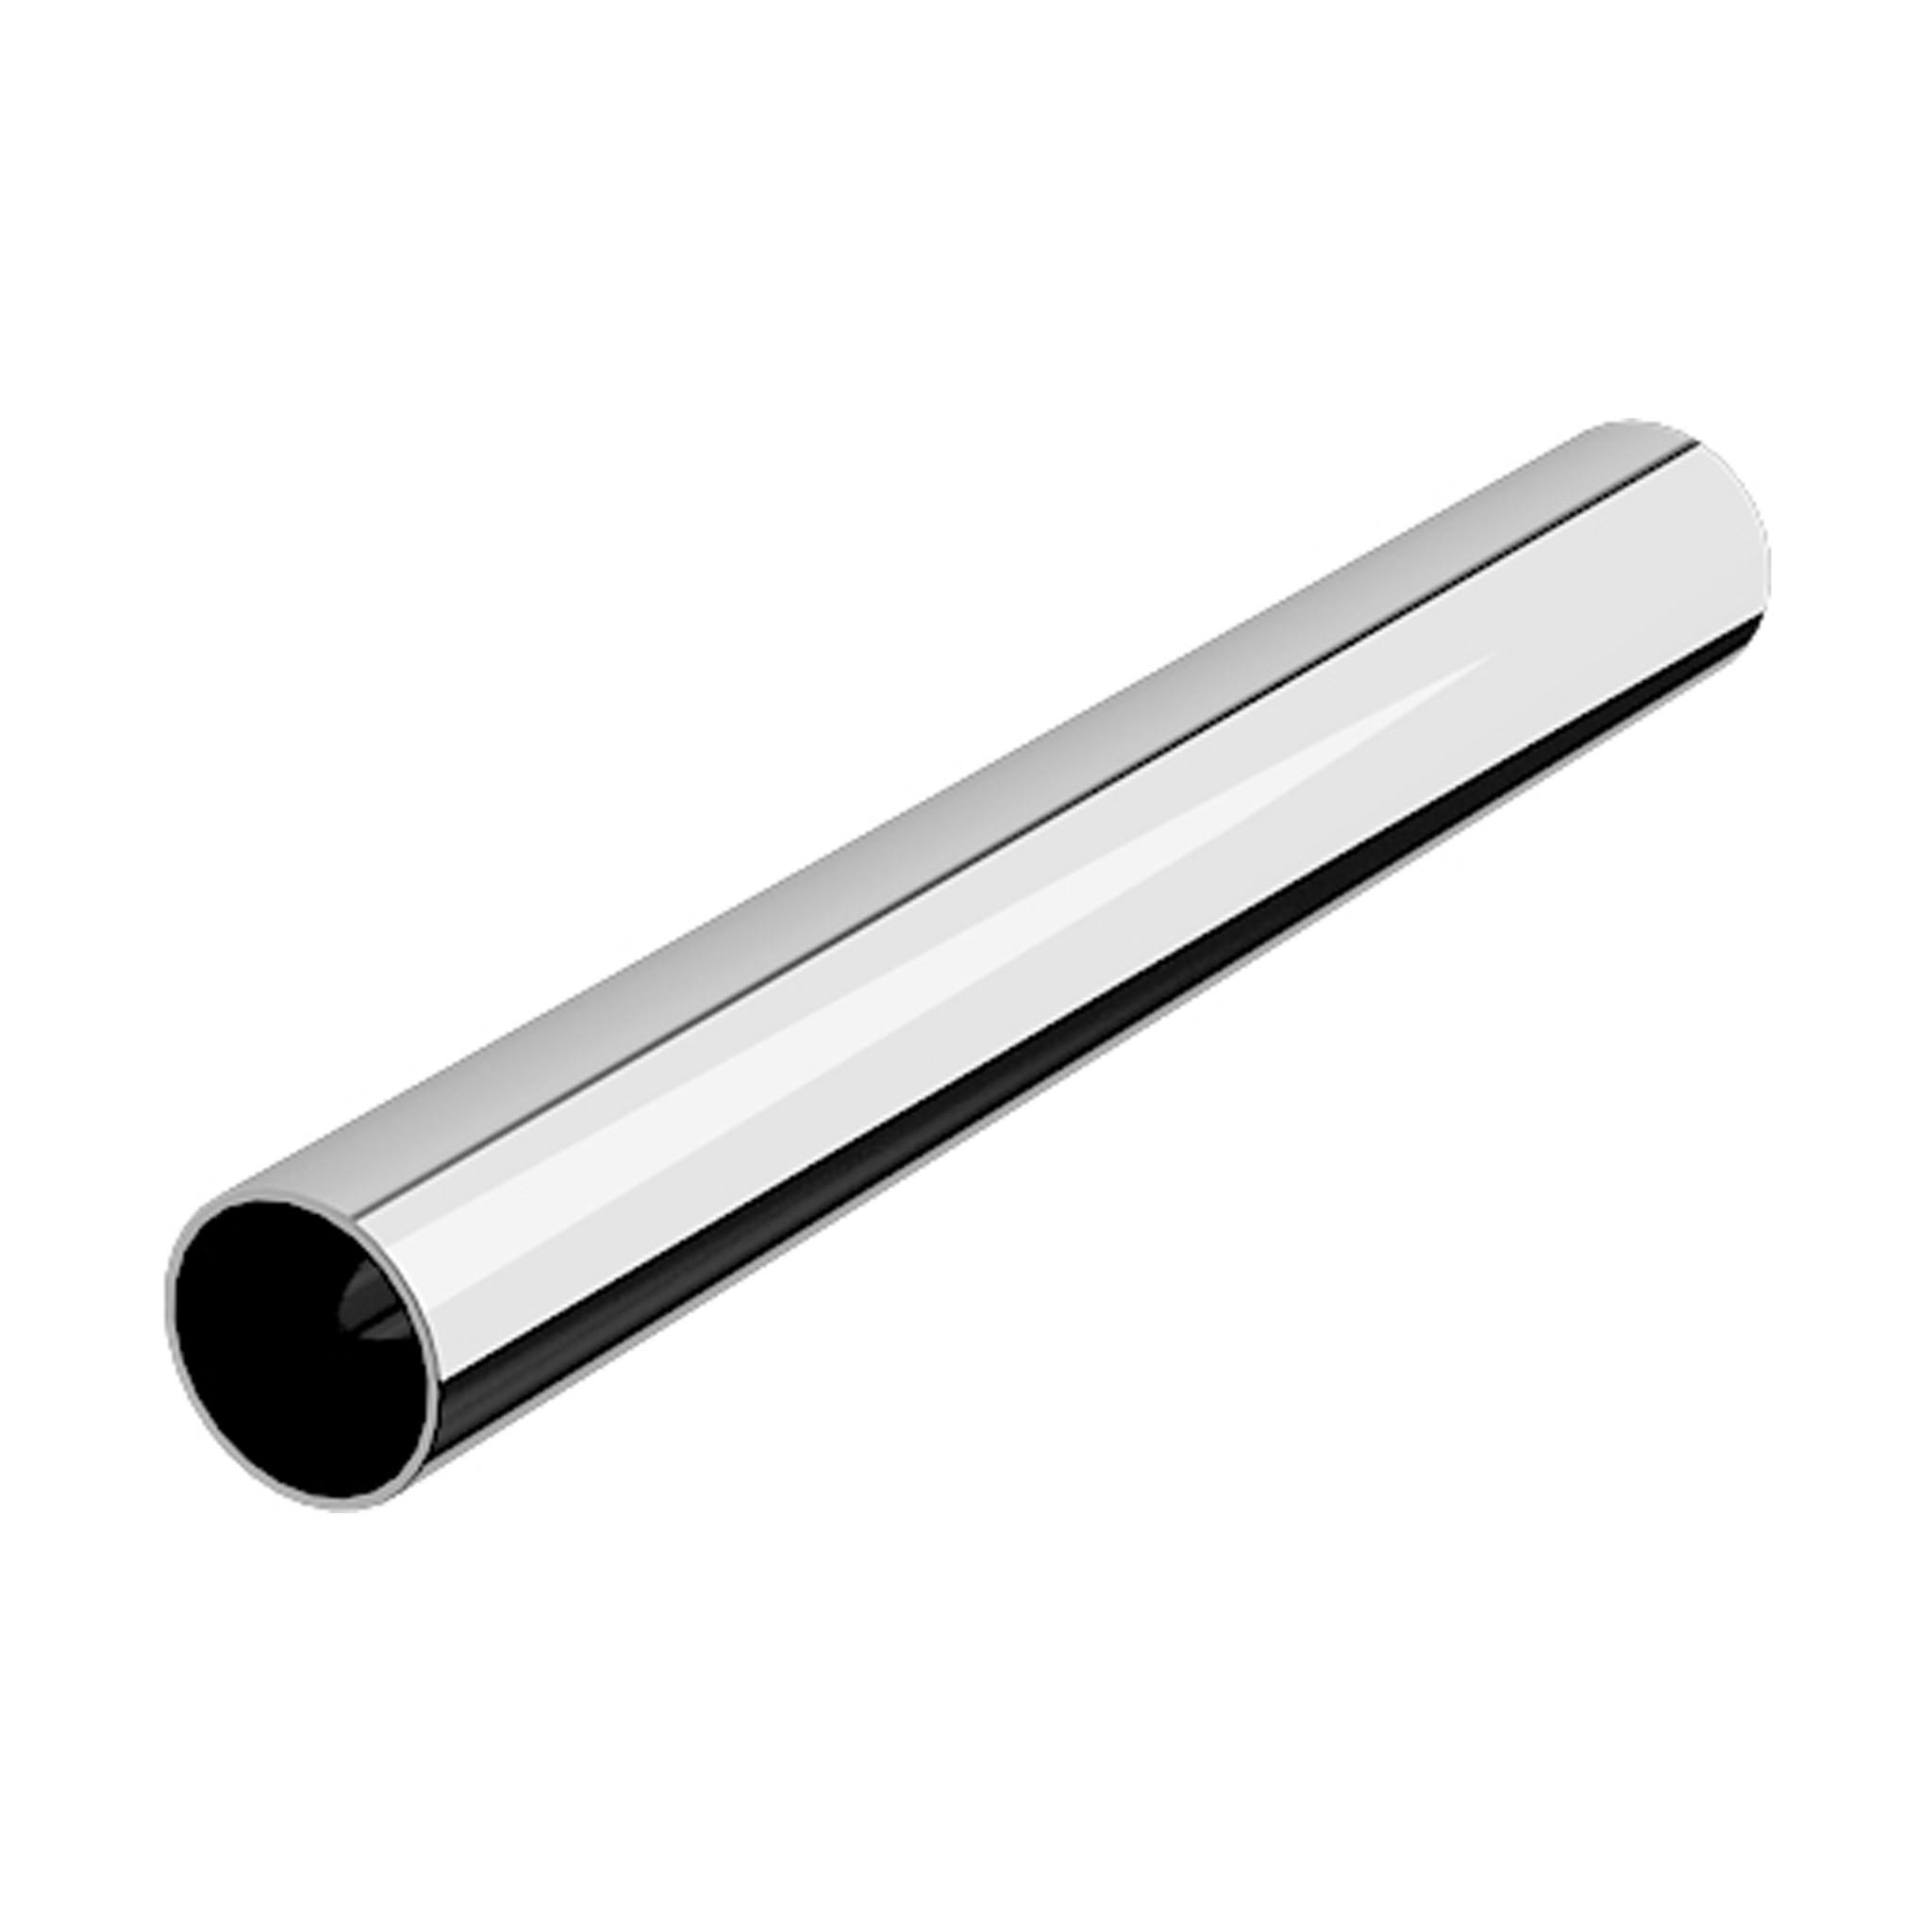 Minisuk wall tube 200 mm, ø25 mm for Minisuk